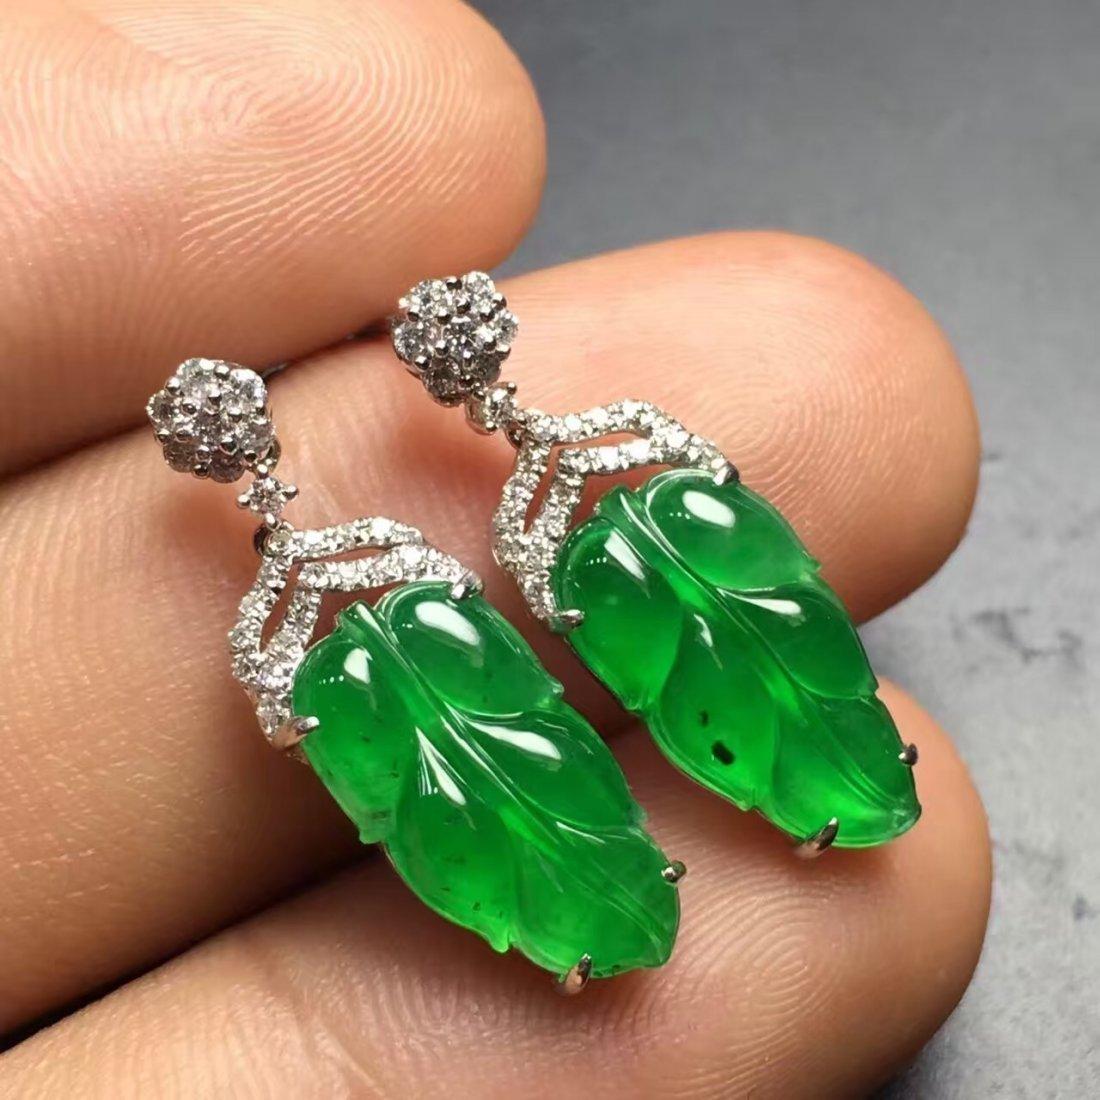 Pair of 18K Gold Diamond Green Jadeite Earrings